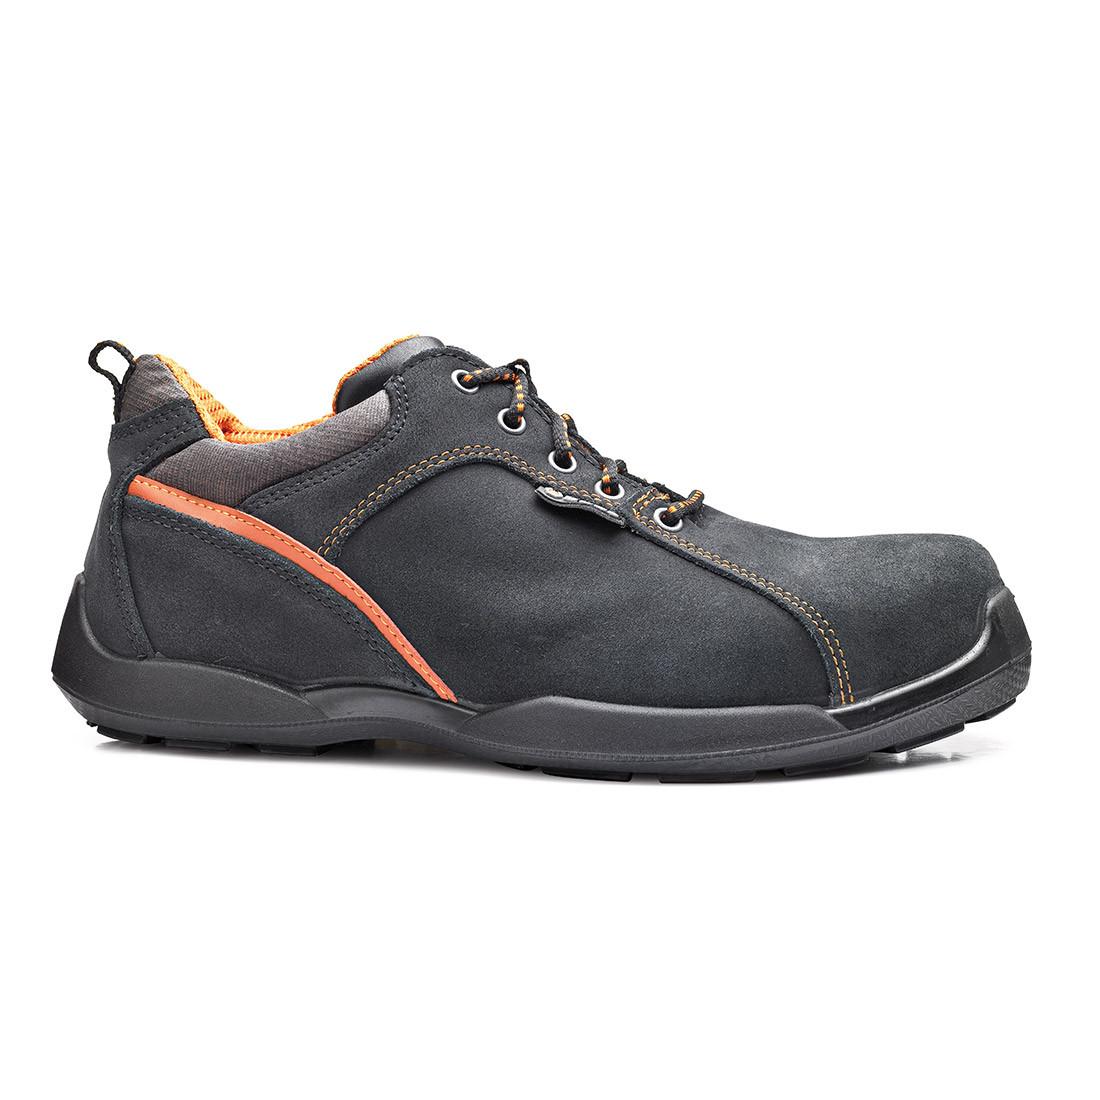 Pantofi Scuba S1P SRC - Incaltaminte de protectie